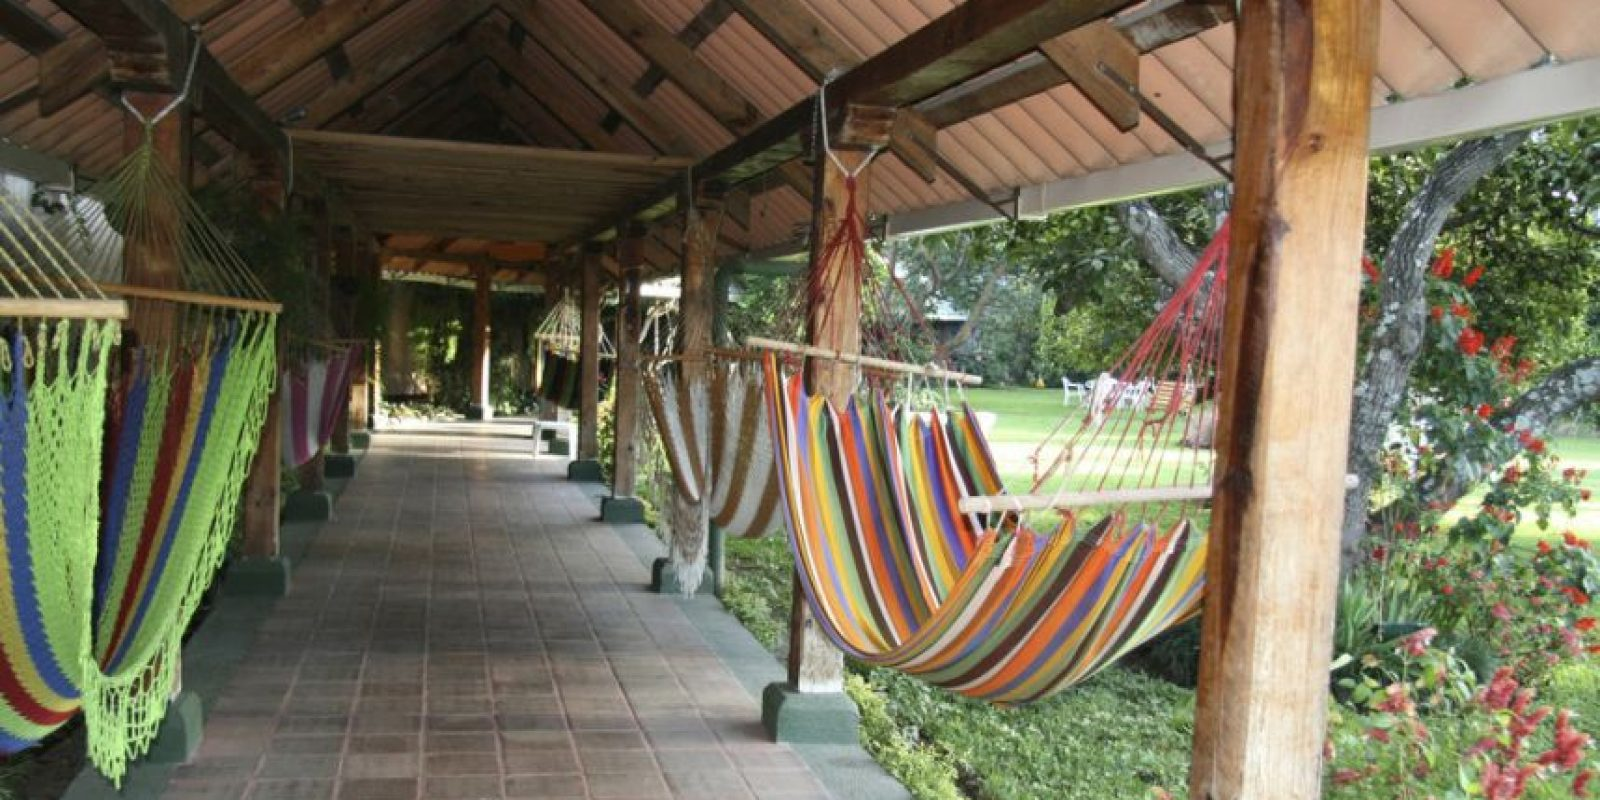 O donde puedas tomar una siesta. Foto:http://www.buzzfeed.com